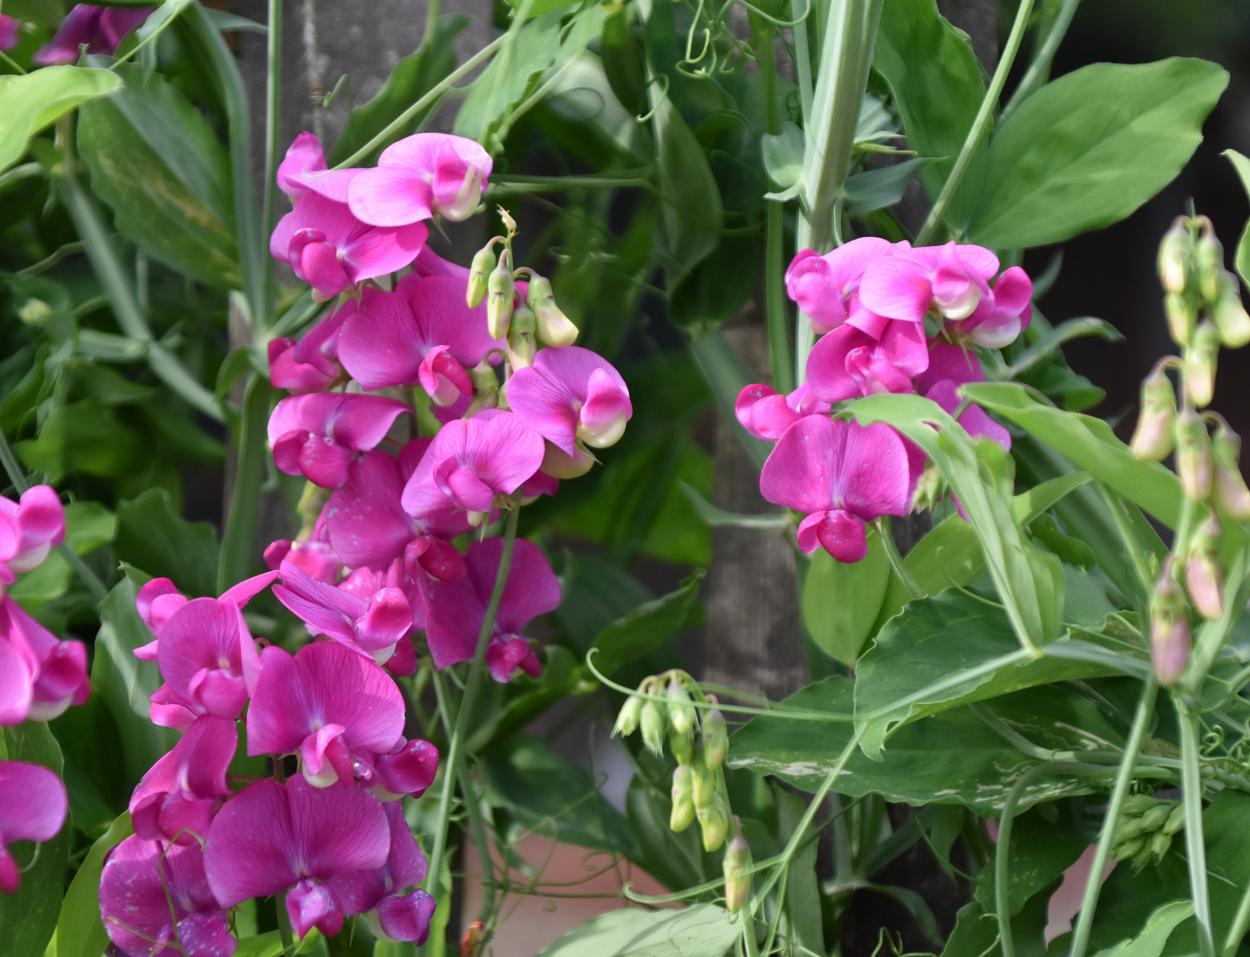 Duftwicken, Blumen, Gartenglück, Lieblingsblumen